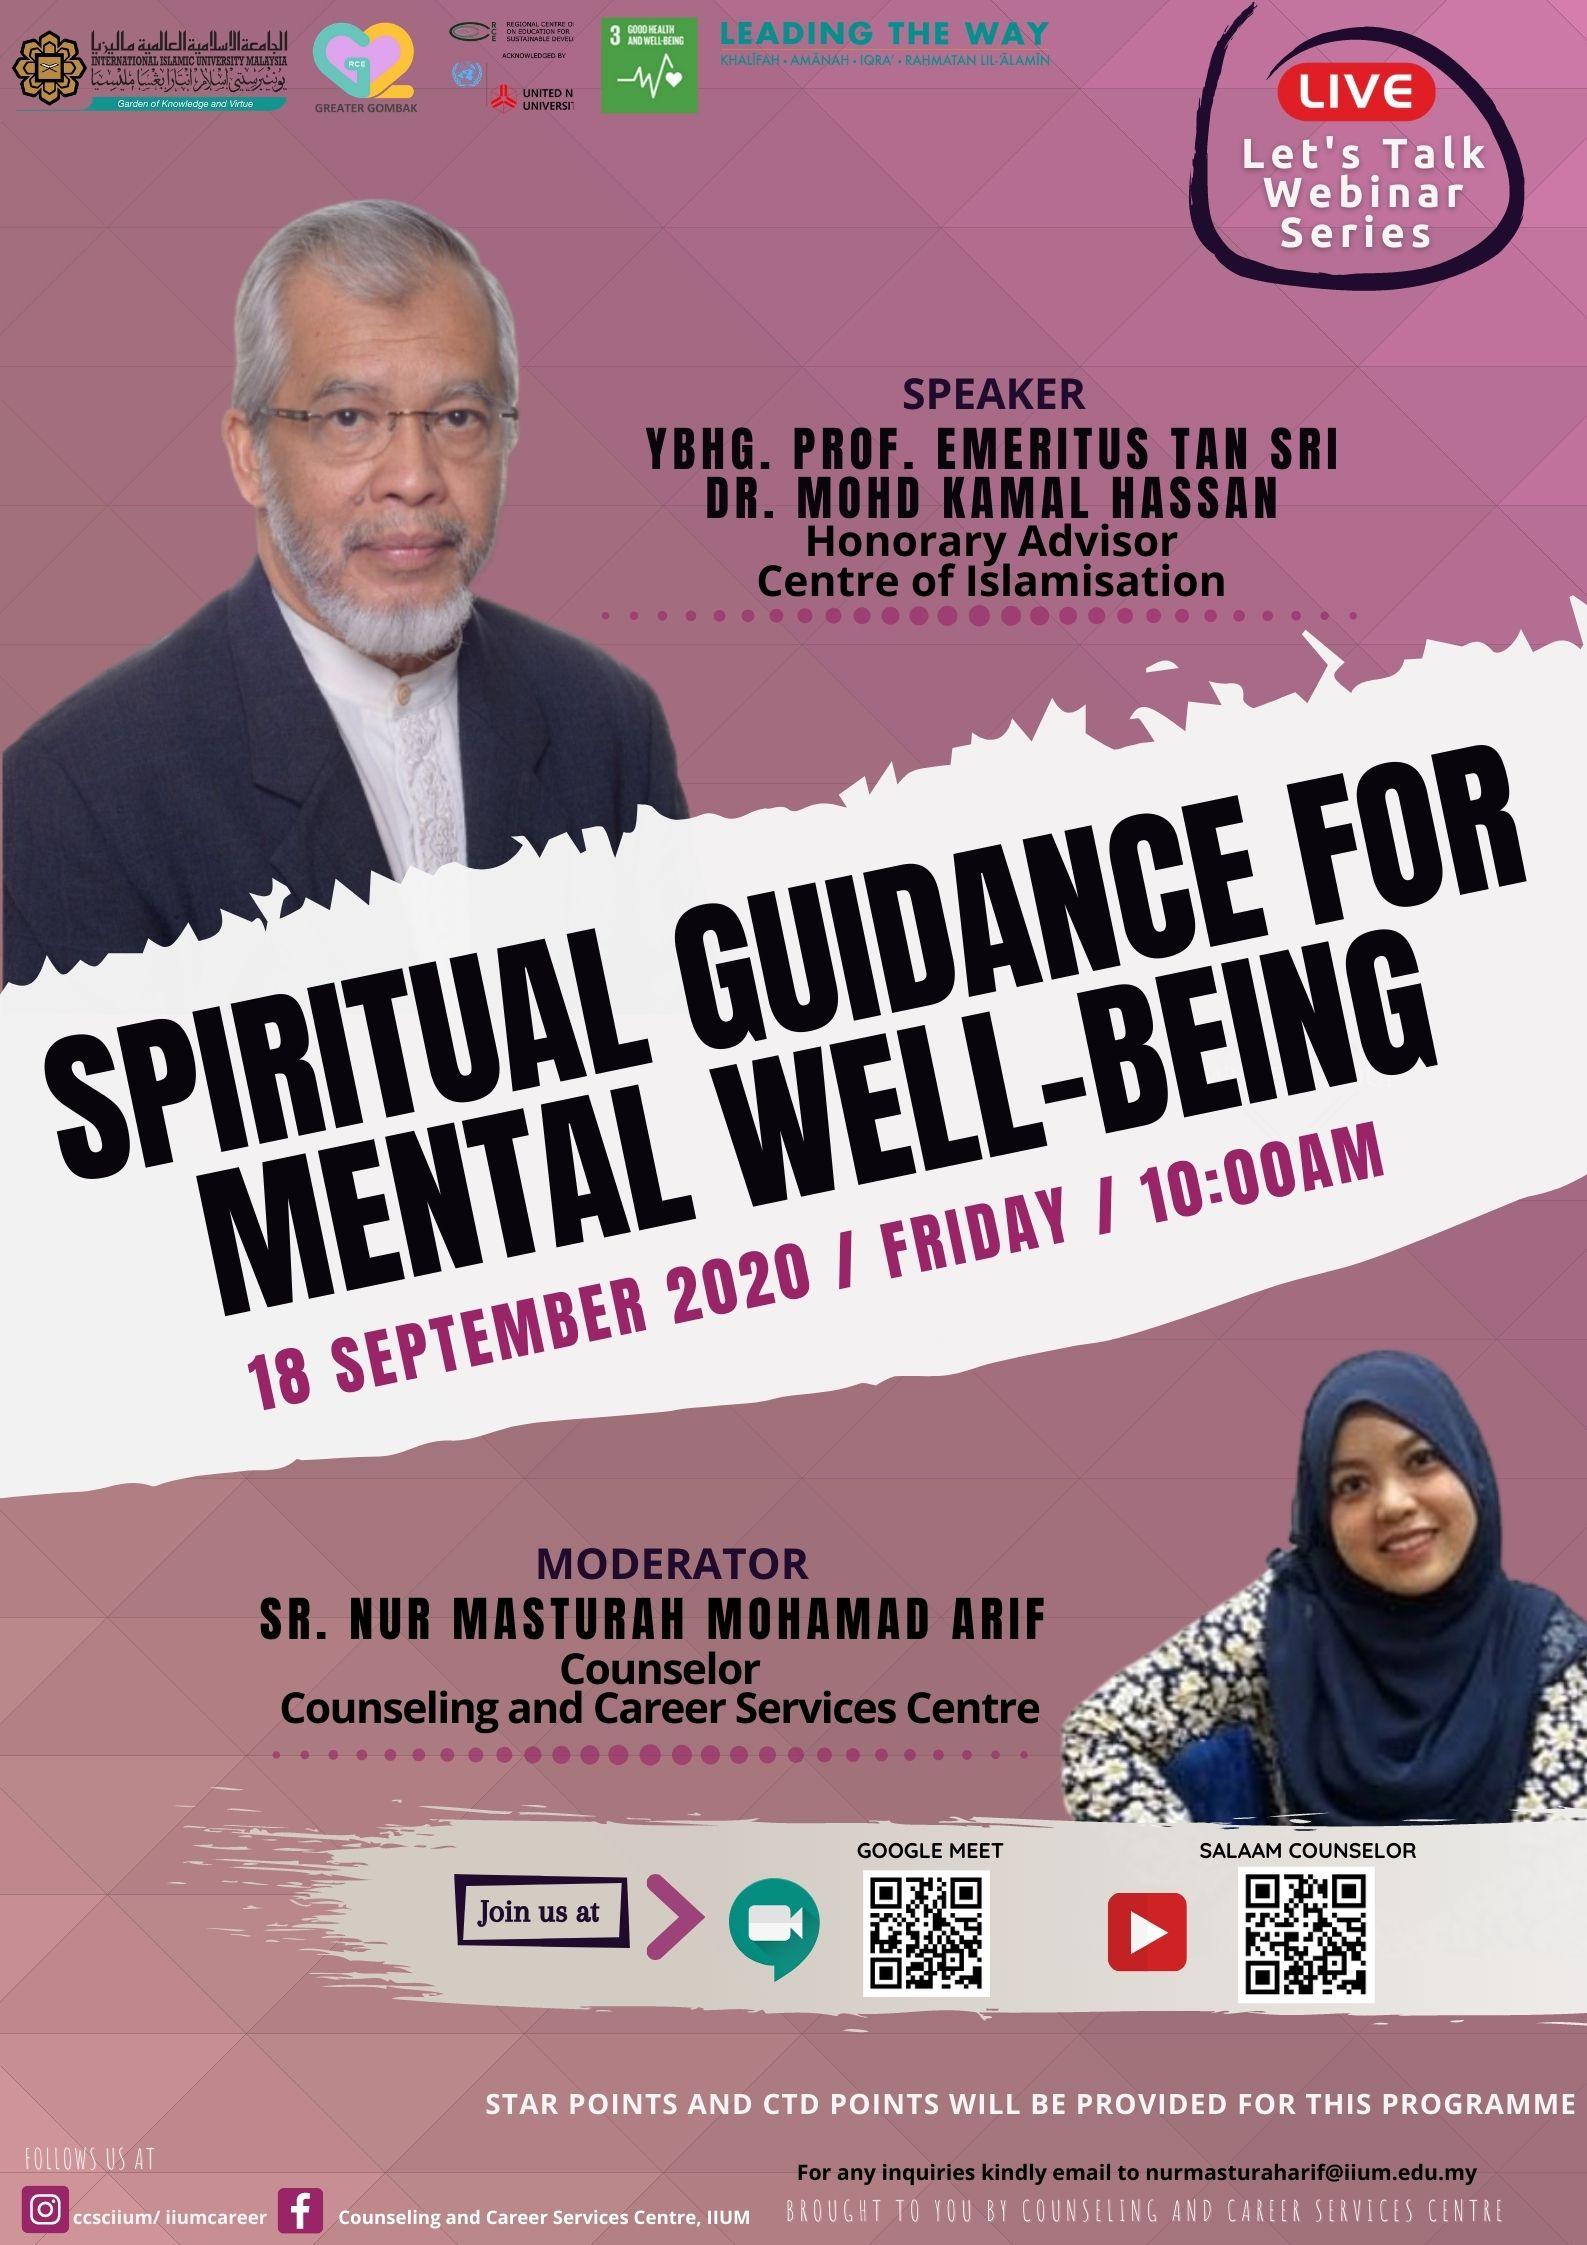 LET'S TALK WEBINAR SERIES : SPIRITUAL GUIDANCE FOR MENTAL WELL-BEING